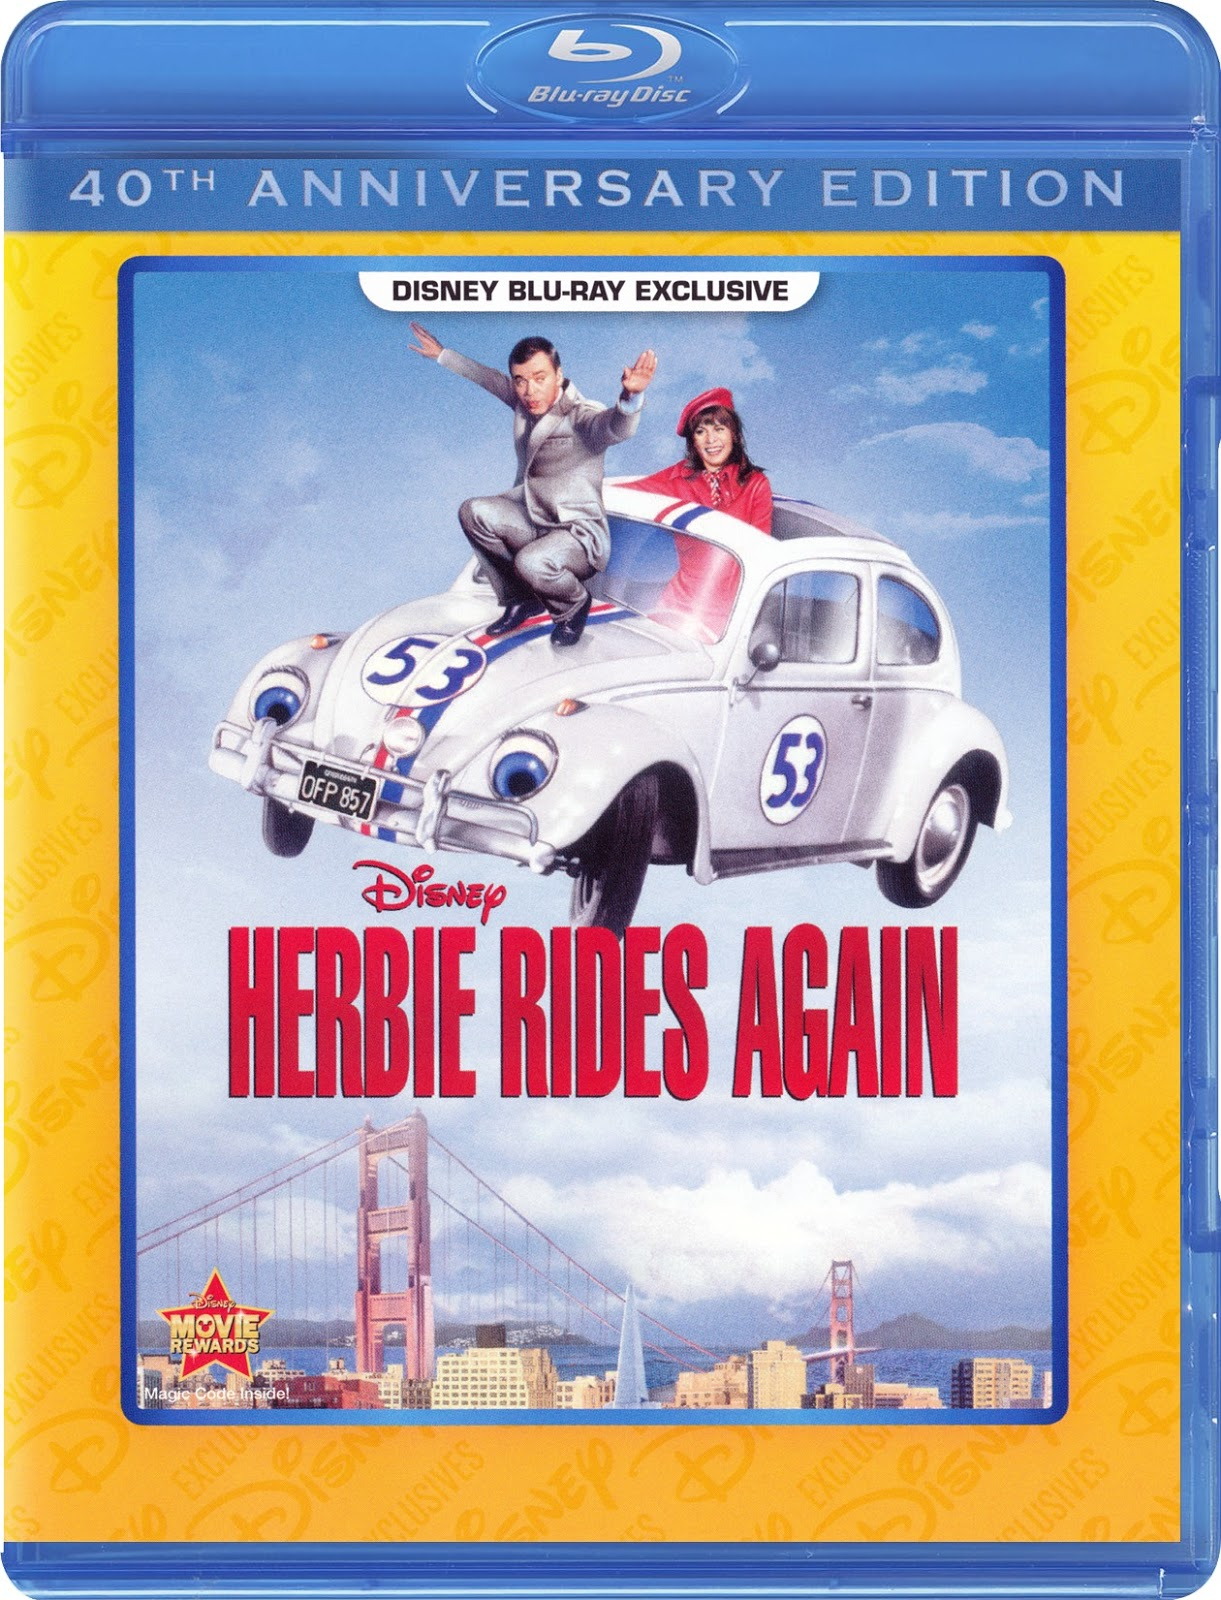 herbie rides again opening dvd - HD1221×1600